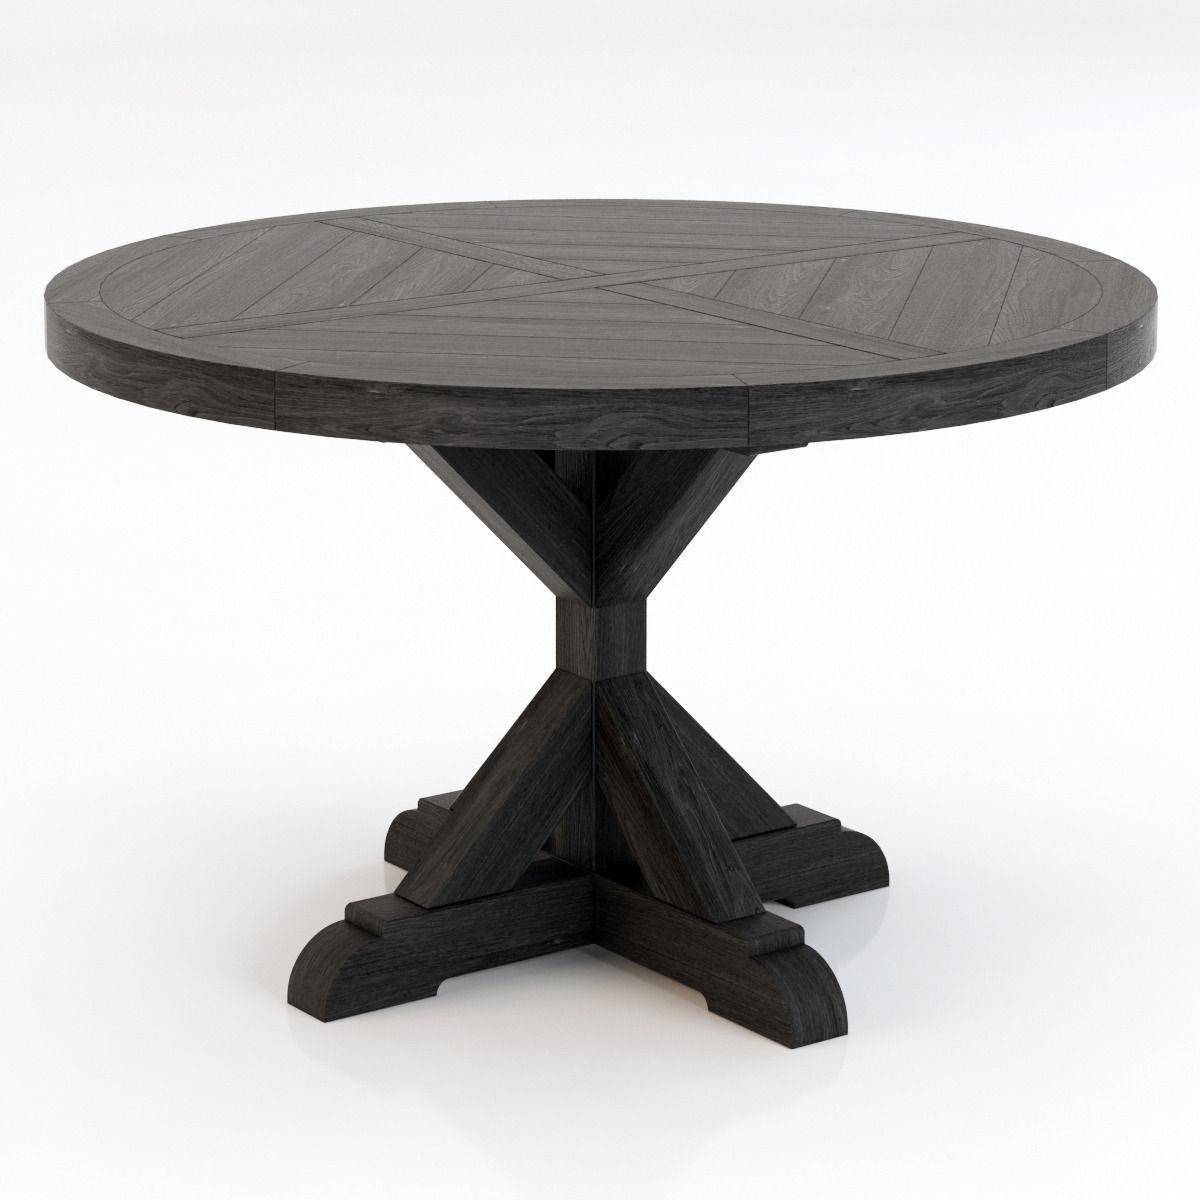 Lovely Restoration Hardware Salvaged Wood X Base Dining Table 3d Model Max Obj 3ds  Fbx Mtl 1 ...